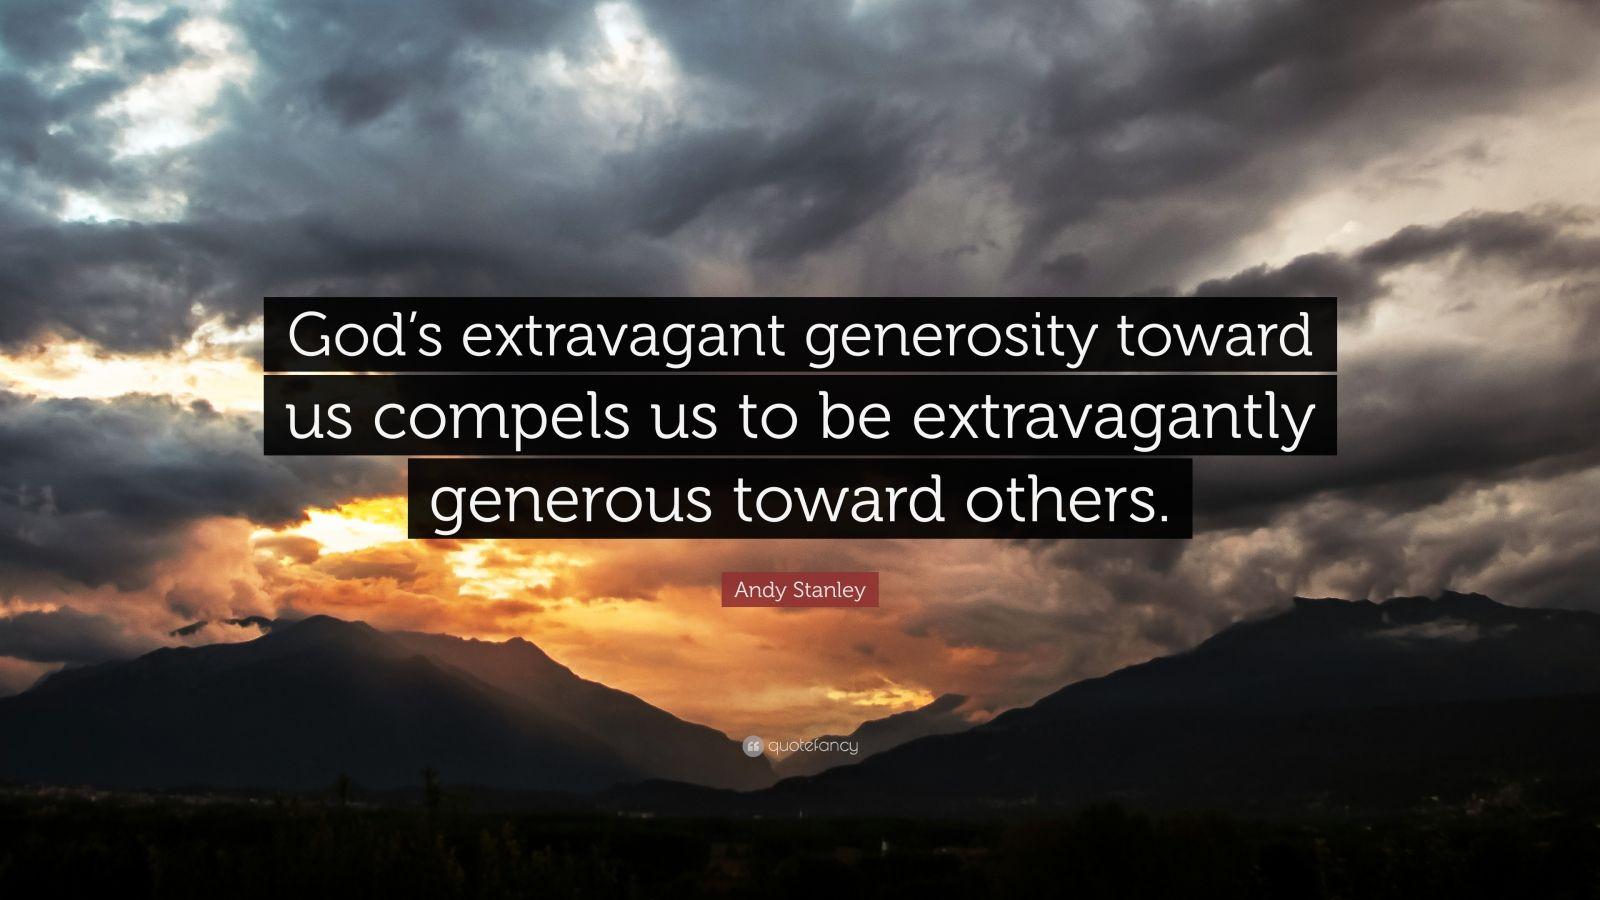 Steve Jobs Motivational Quotes Wallpaper Andy Stanley Quote God S Extravagant Generosity Toward